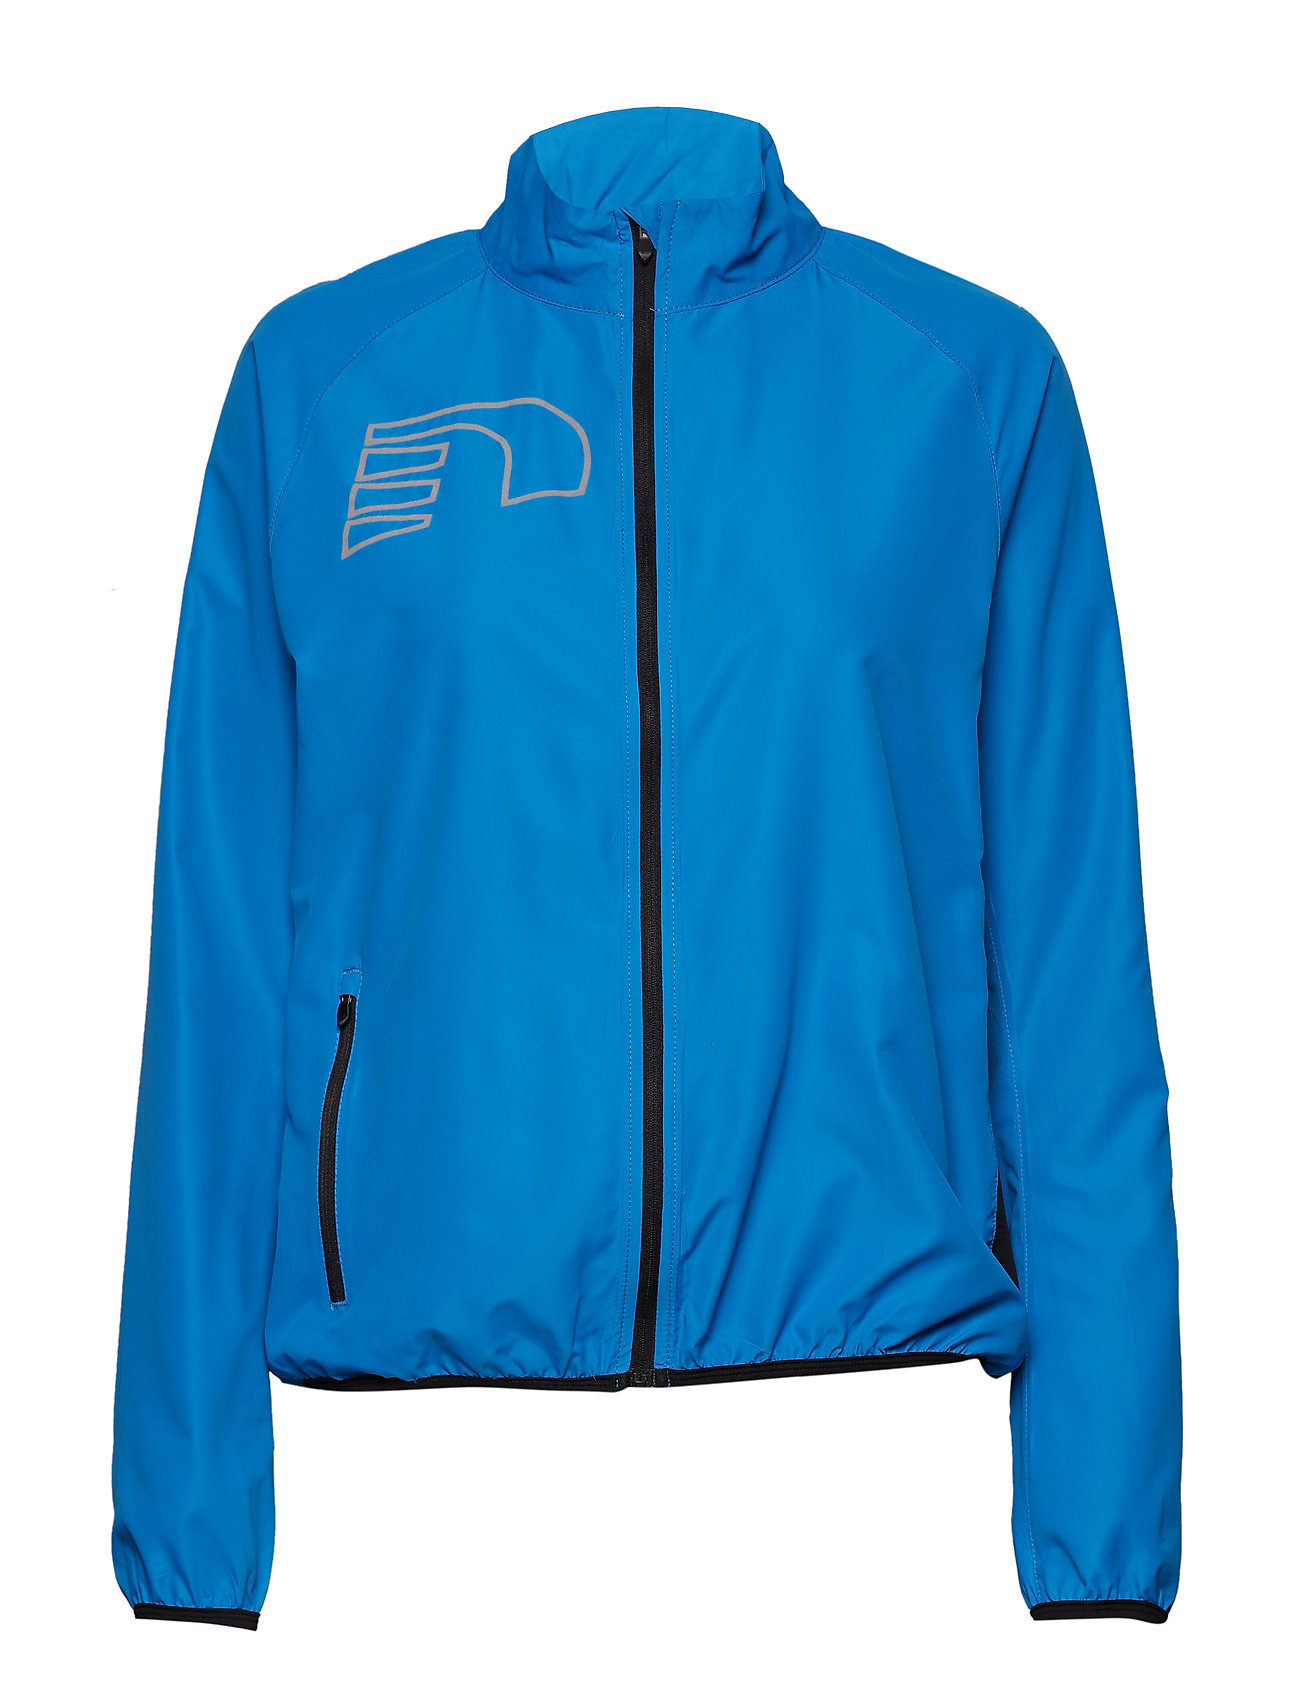 Newline Core Jacket - BLUE